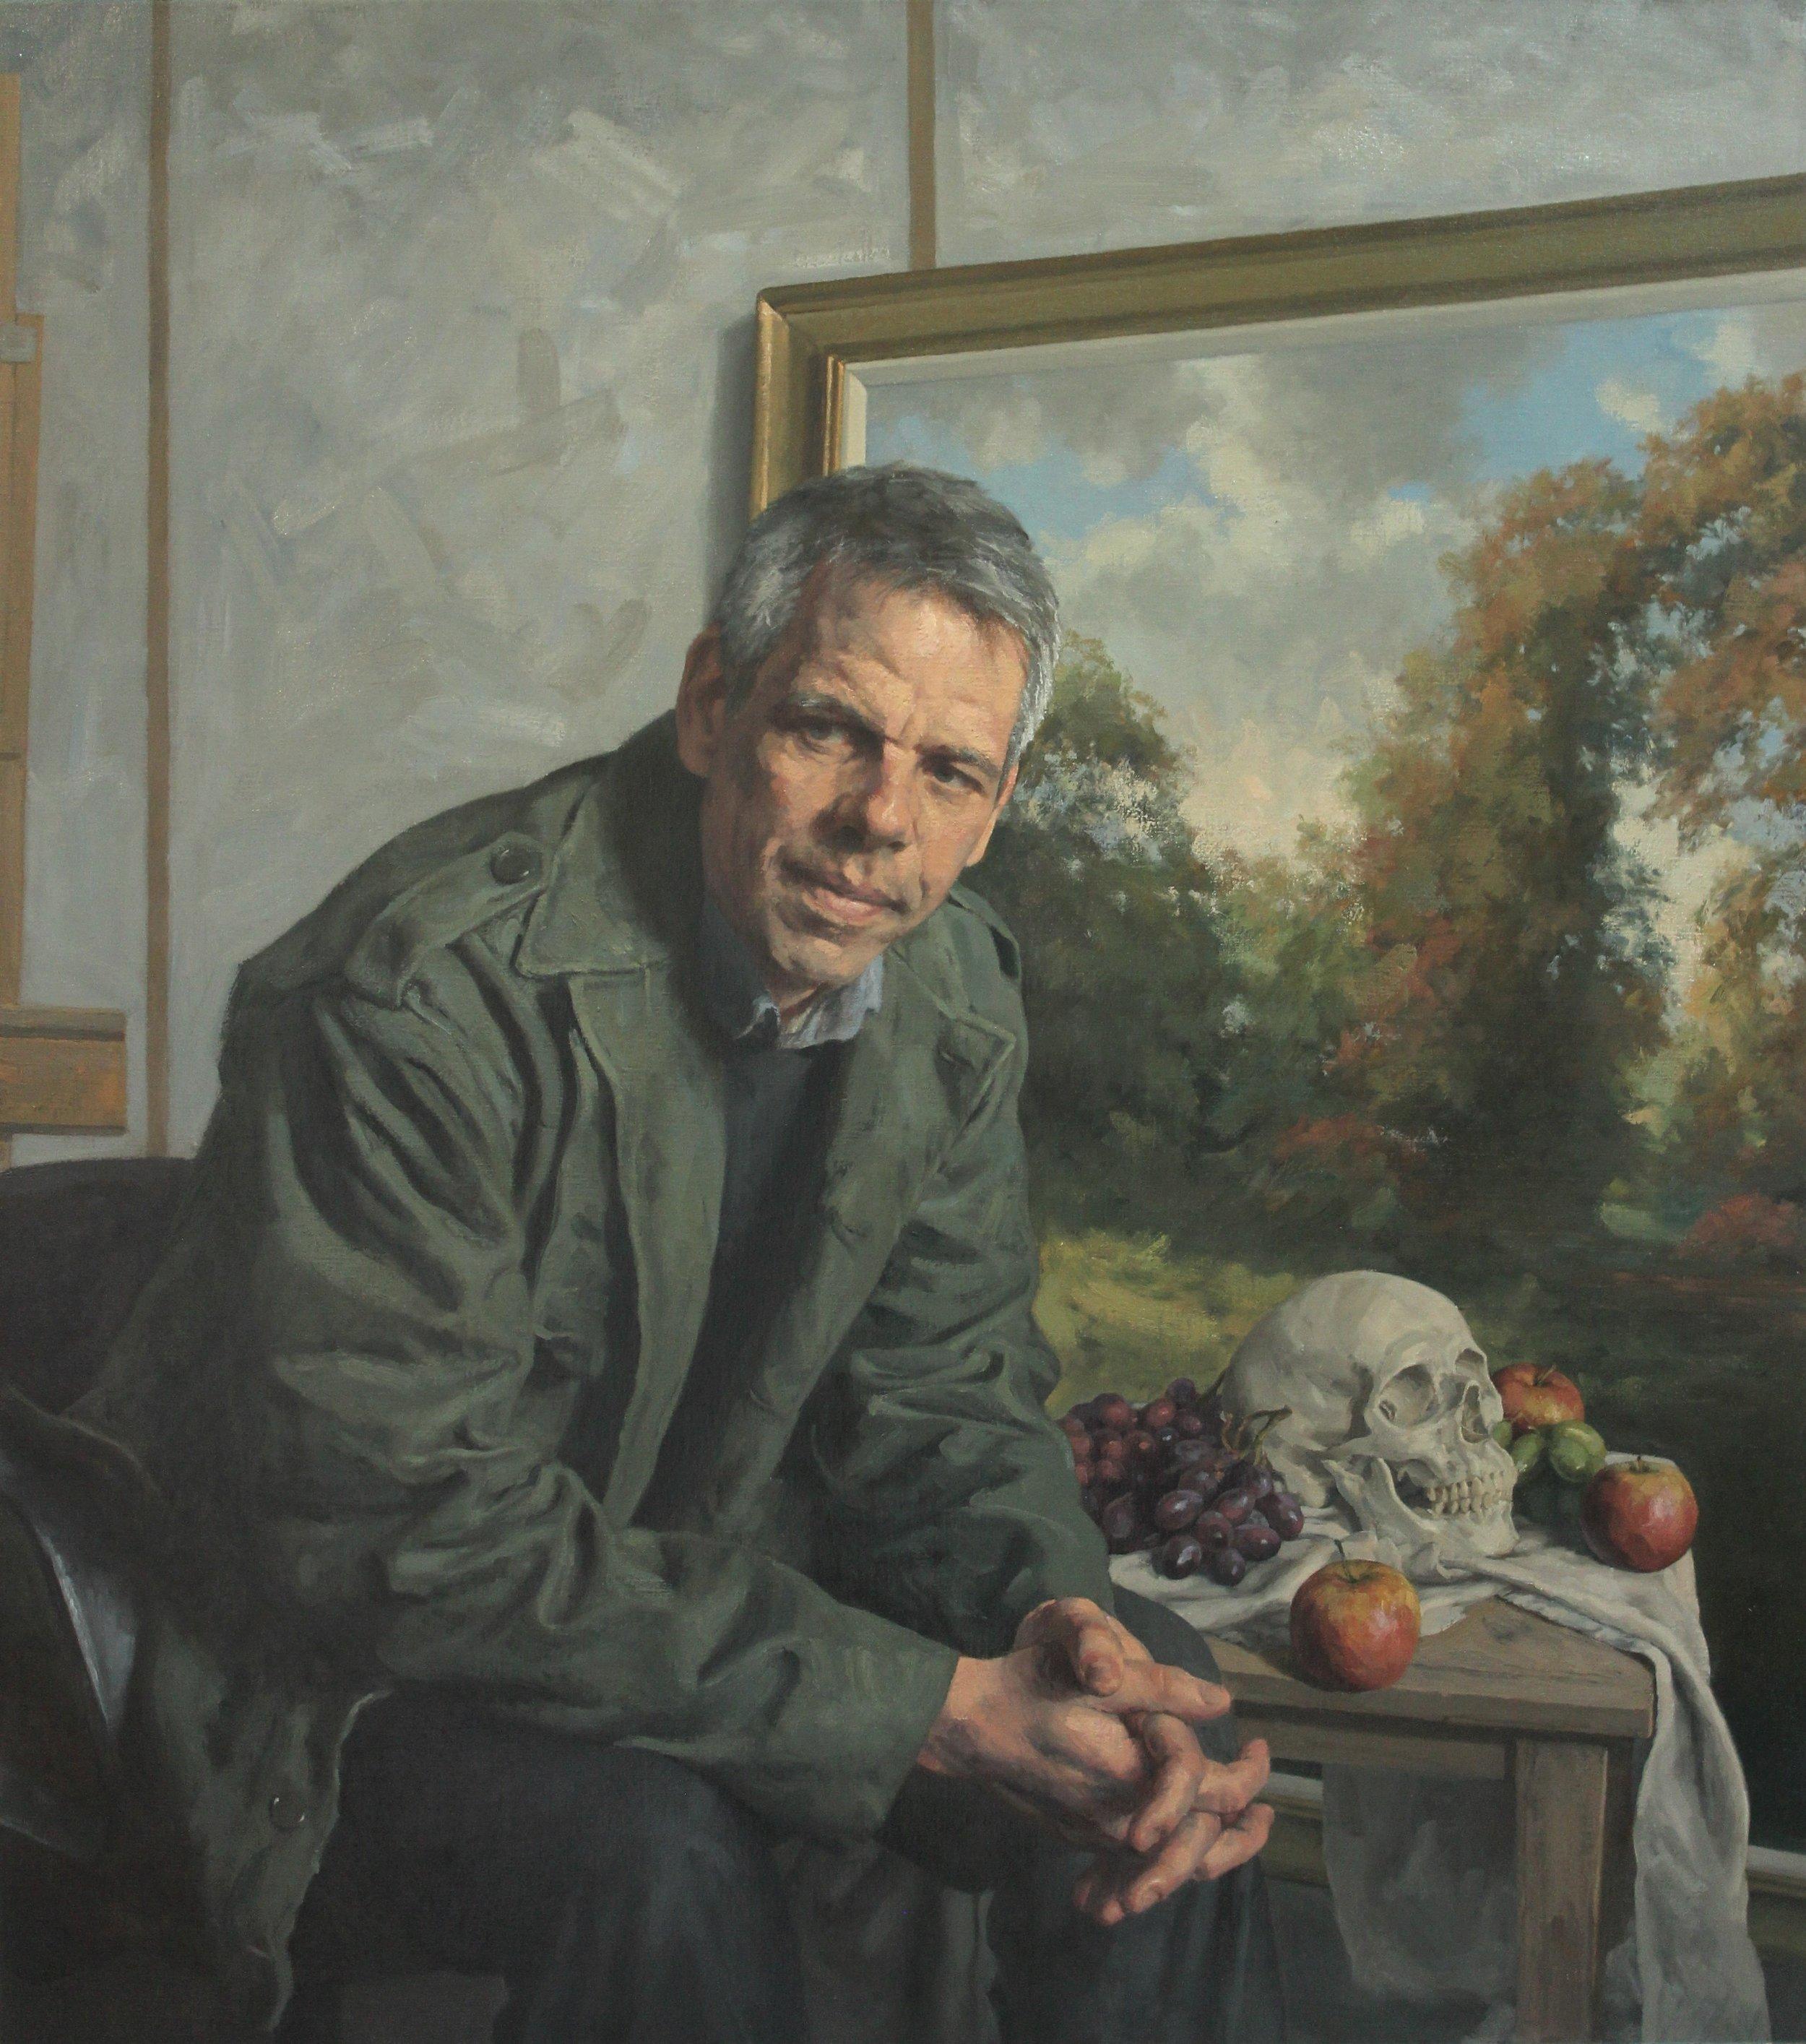 PAUL REID, Portrait of Tim